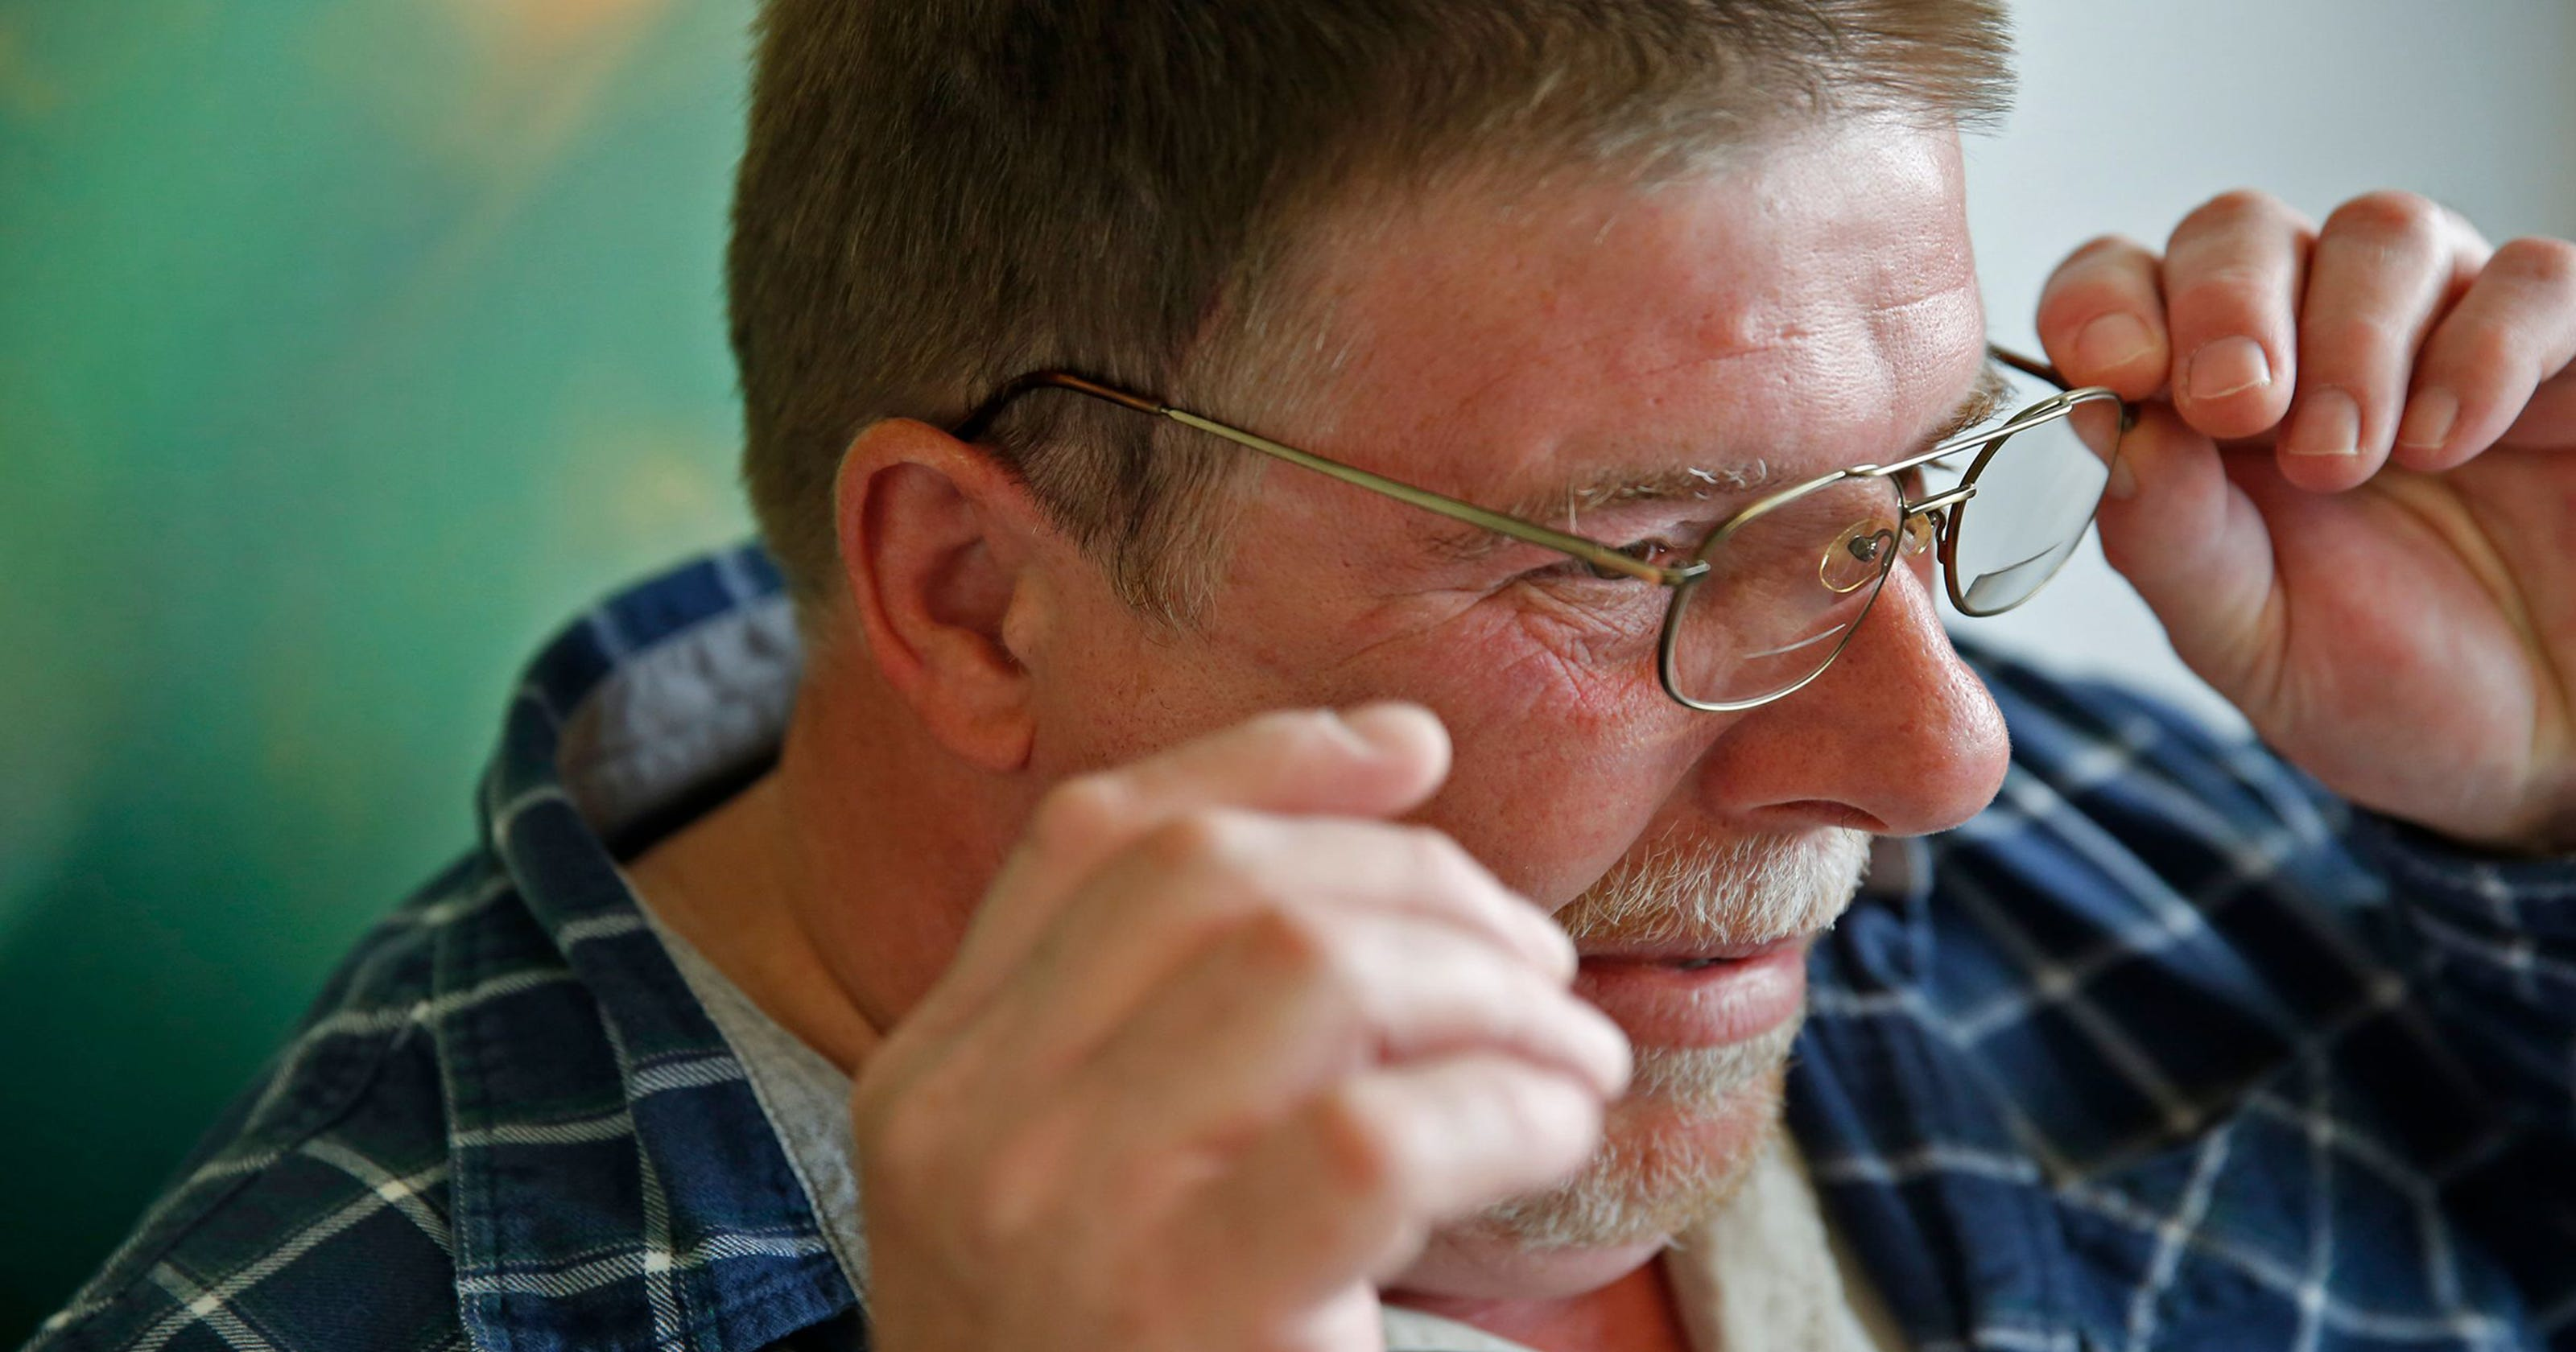 Fluid in the ear: Antibiotics or Brain Surgery?